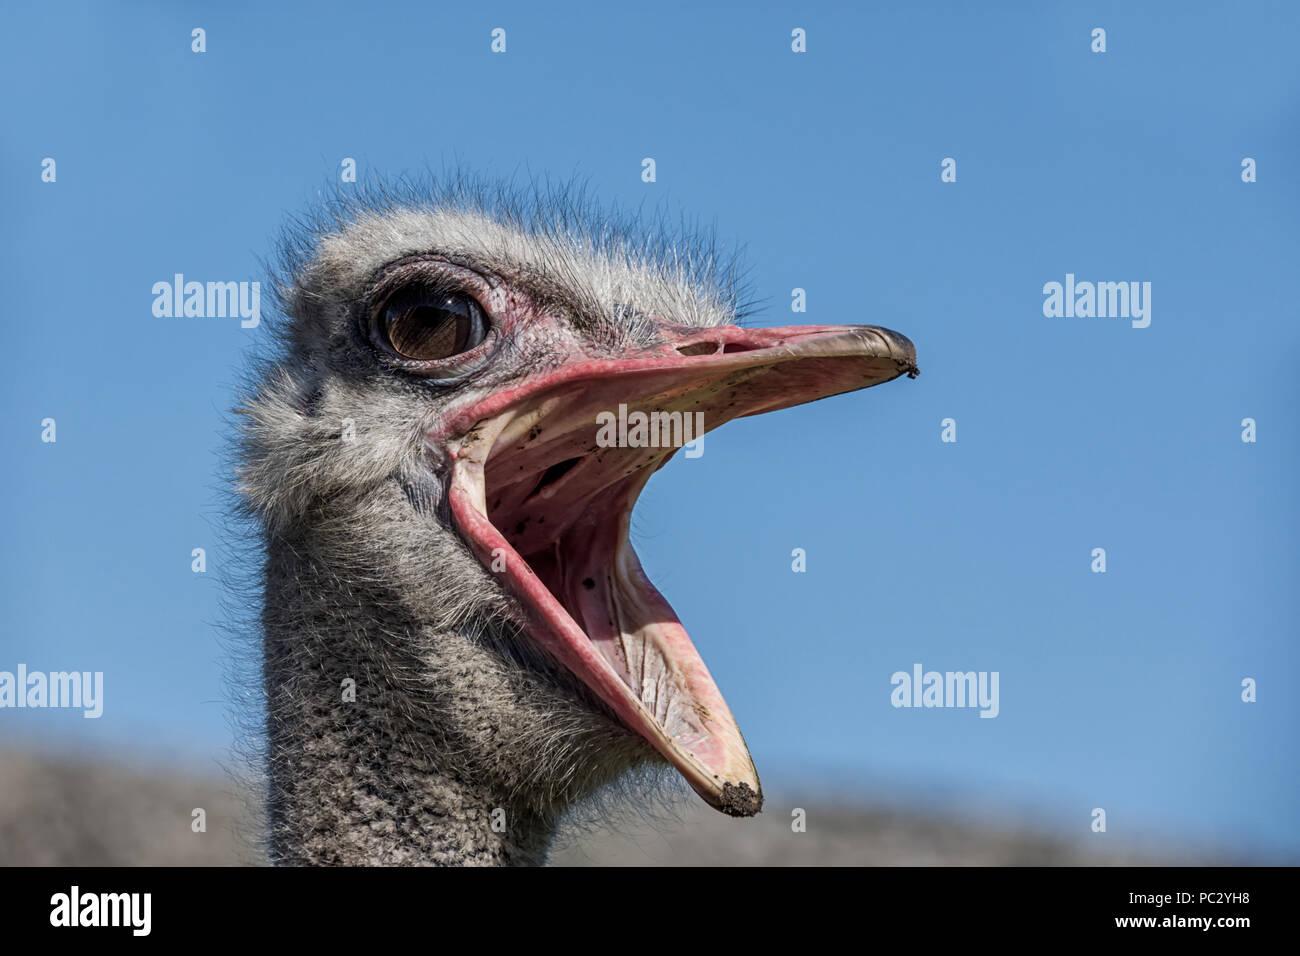 A closeup portrait of an Ostrich head - Stock Image